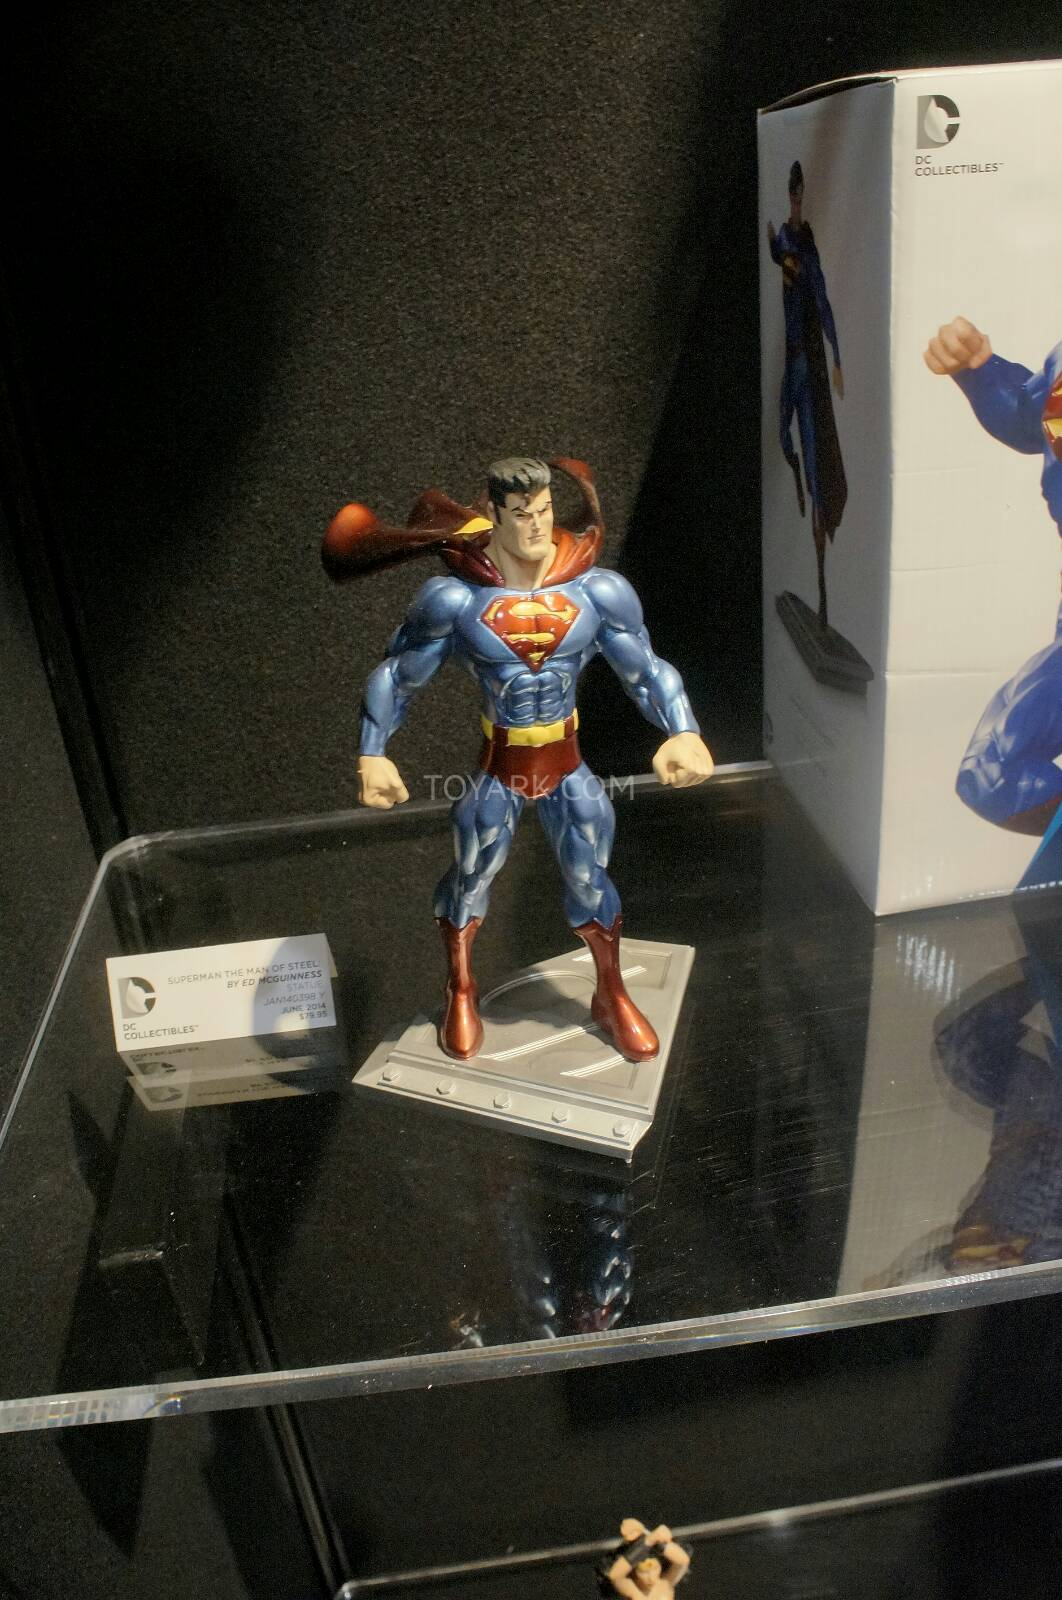 [Toy Fair 2014] DC Collectibles Toy-Fair-2014-DC-Collectibles-008